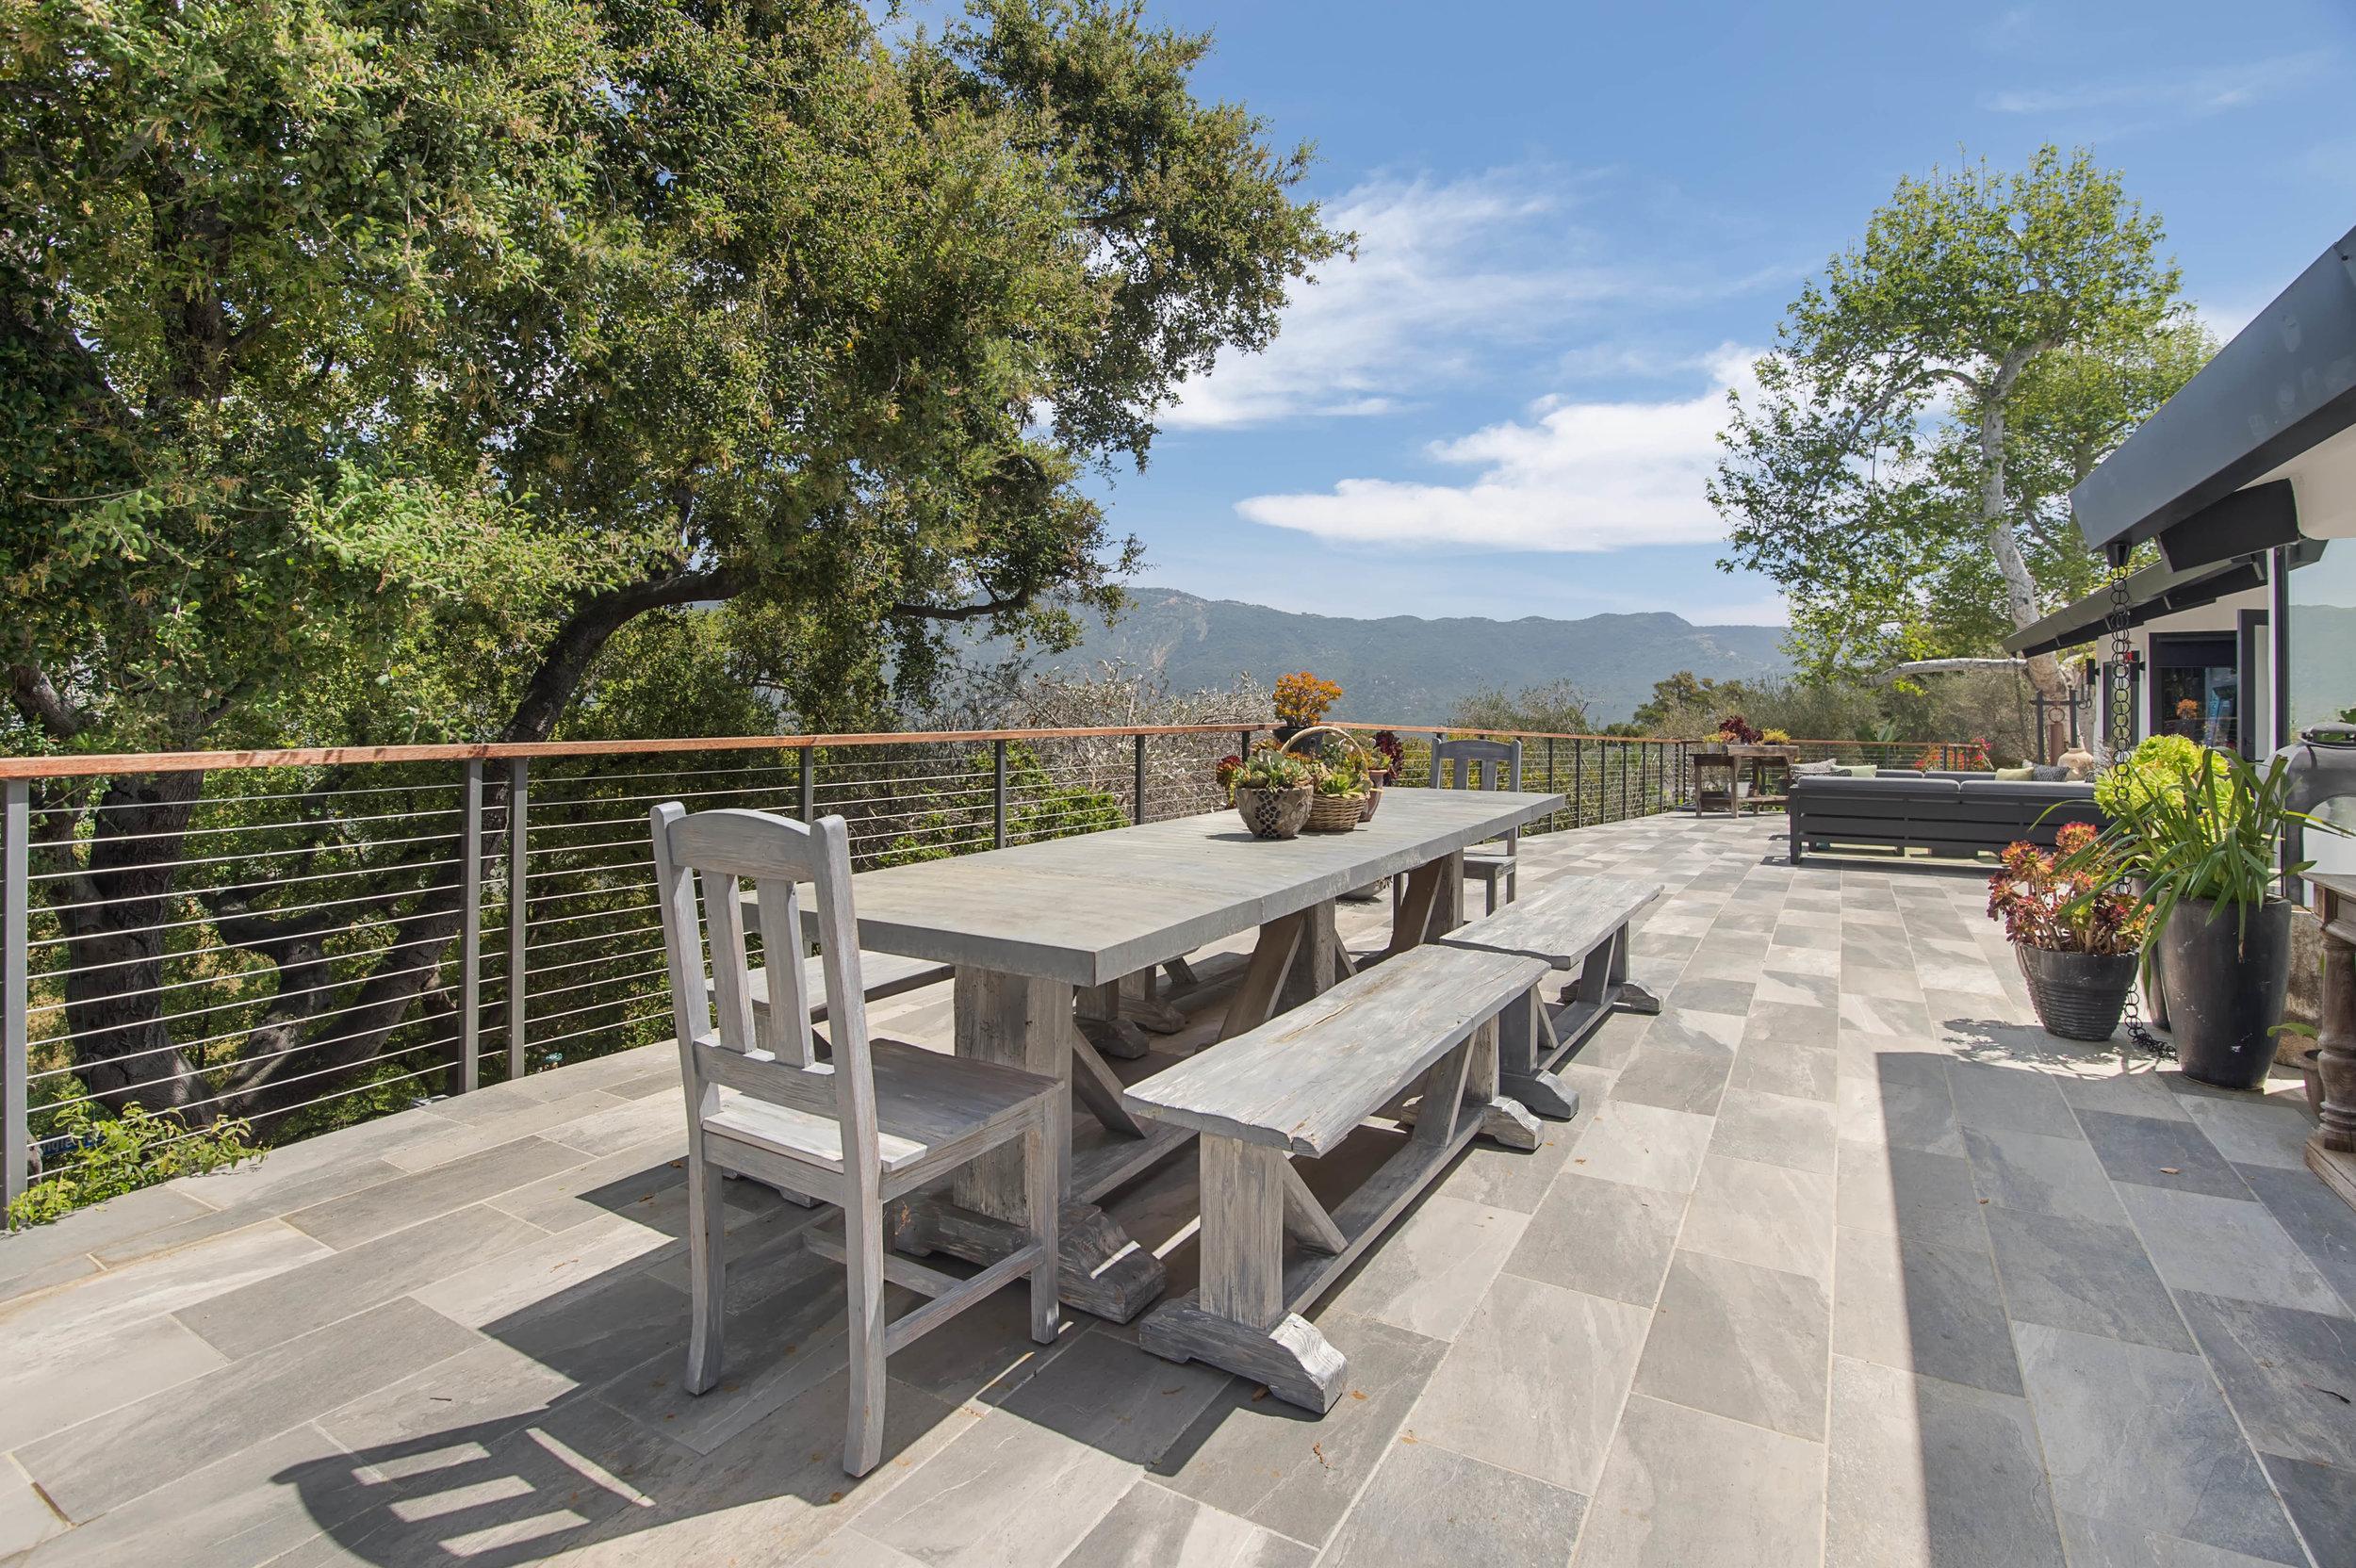 004 Outdoor Dining 26272 Cool Glen Way Malibu For Sale Luxury Real Estate.jpg